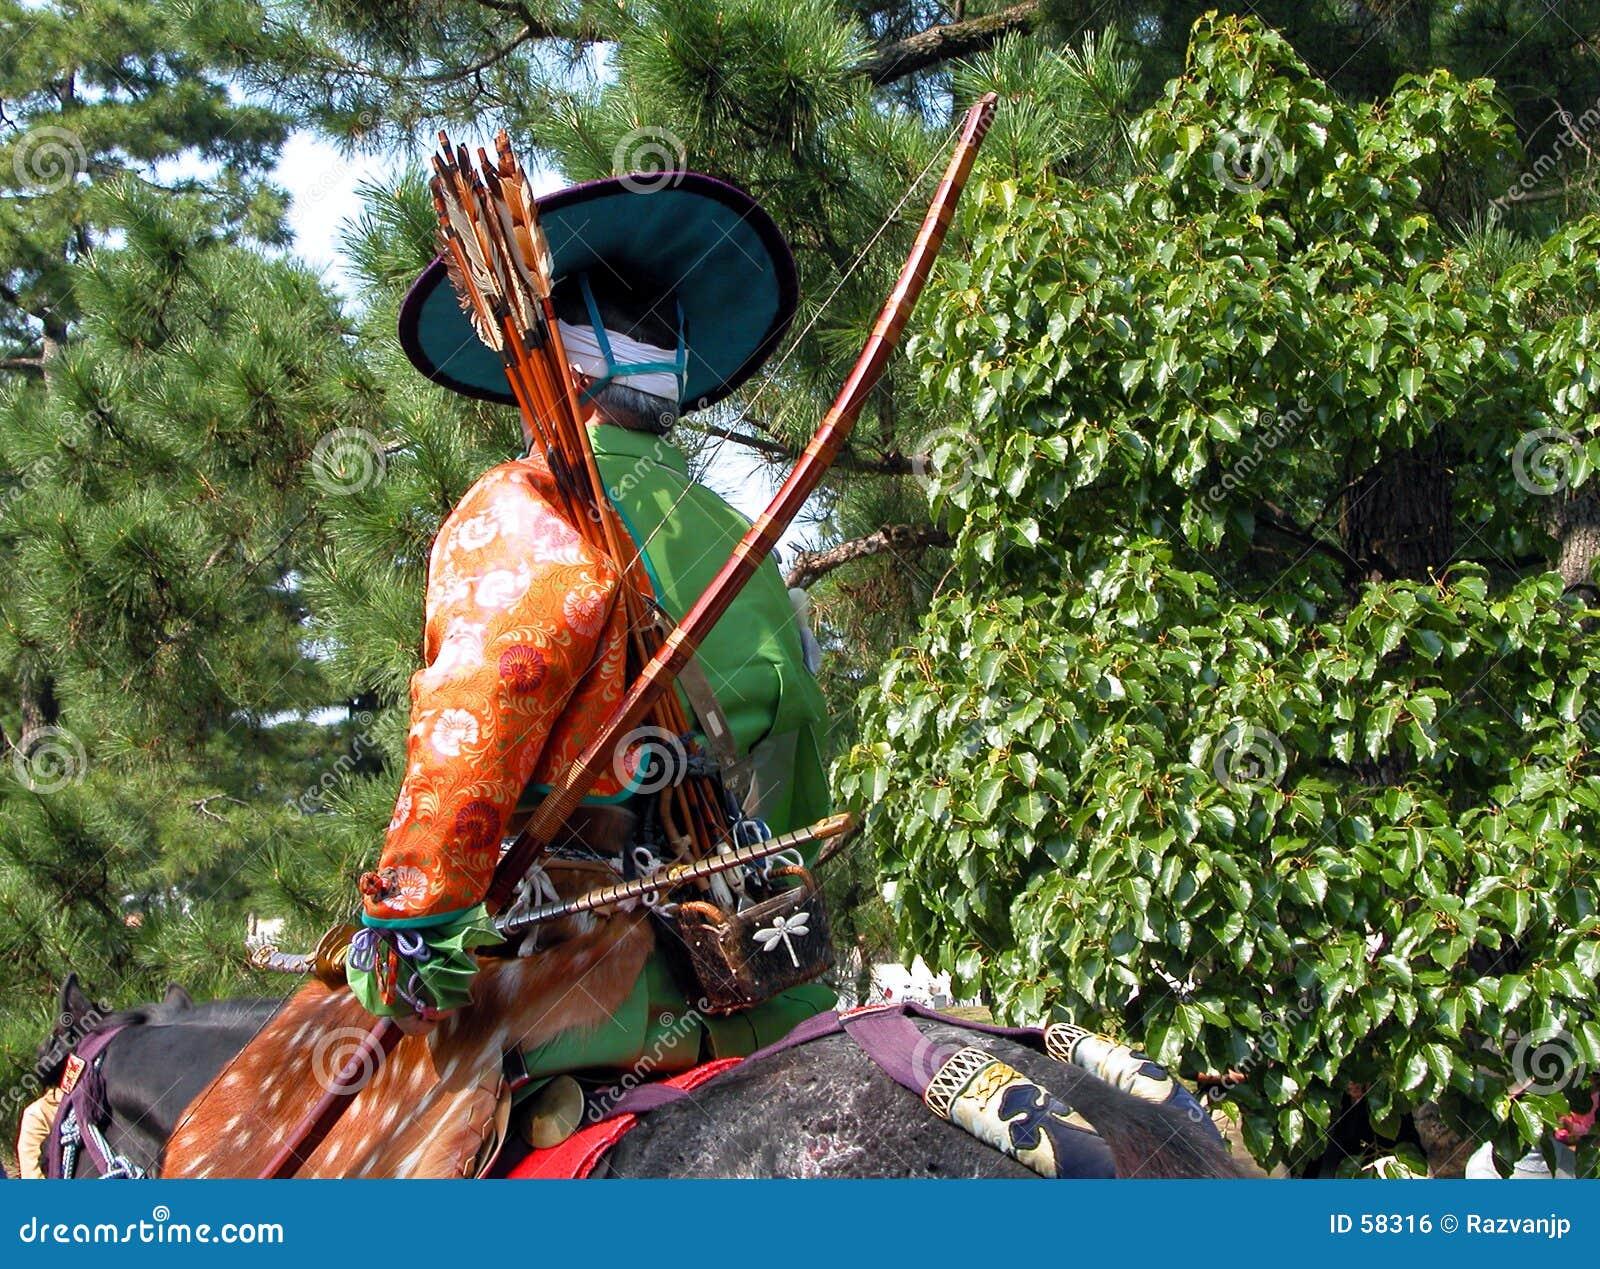 Le dernier samouraï? :)